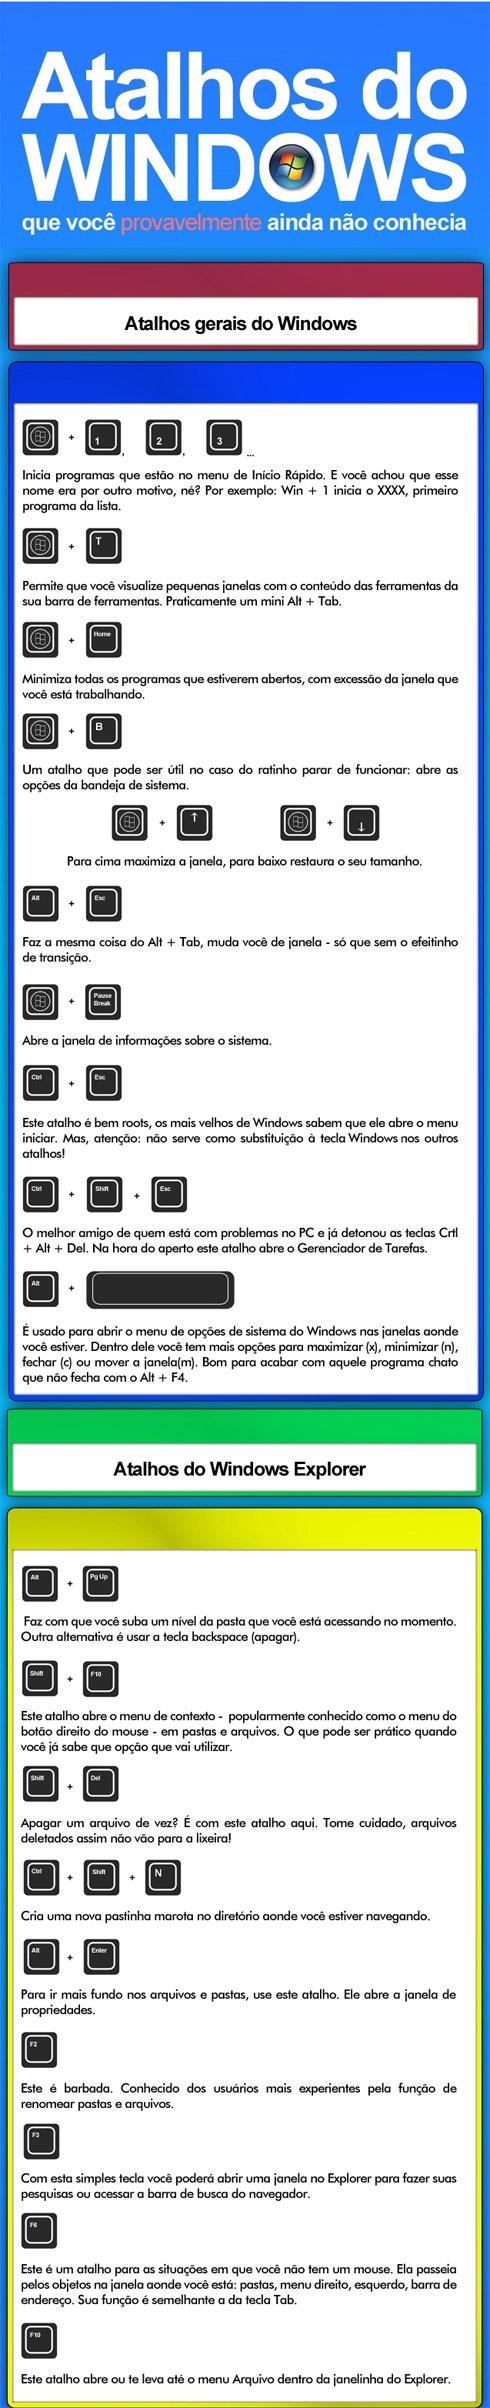 Windows: Atalhos do teclado inusitados [infográfico]